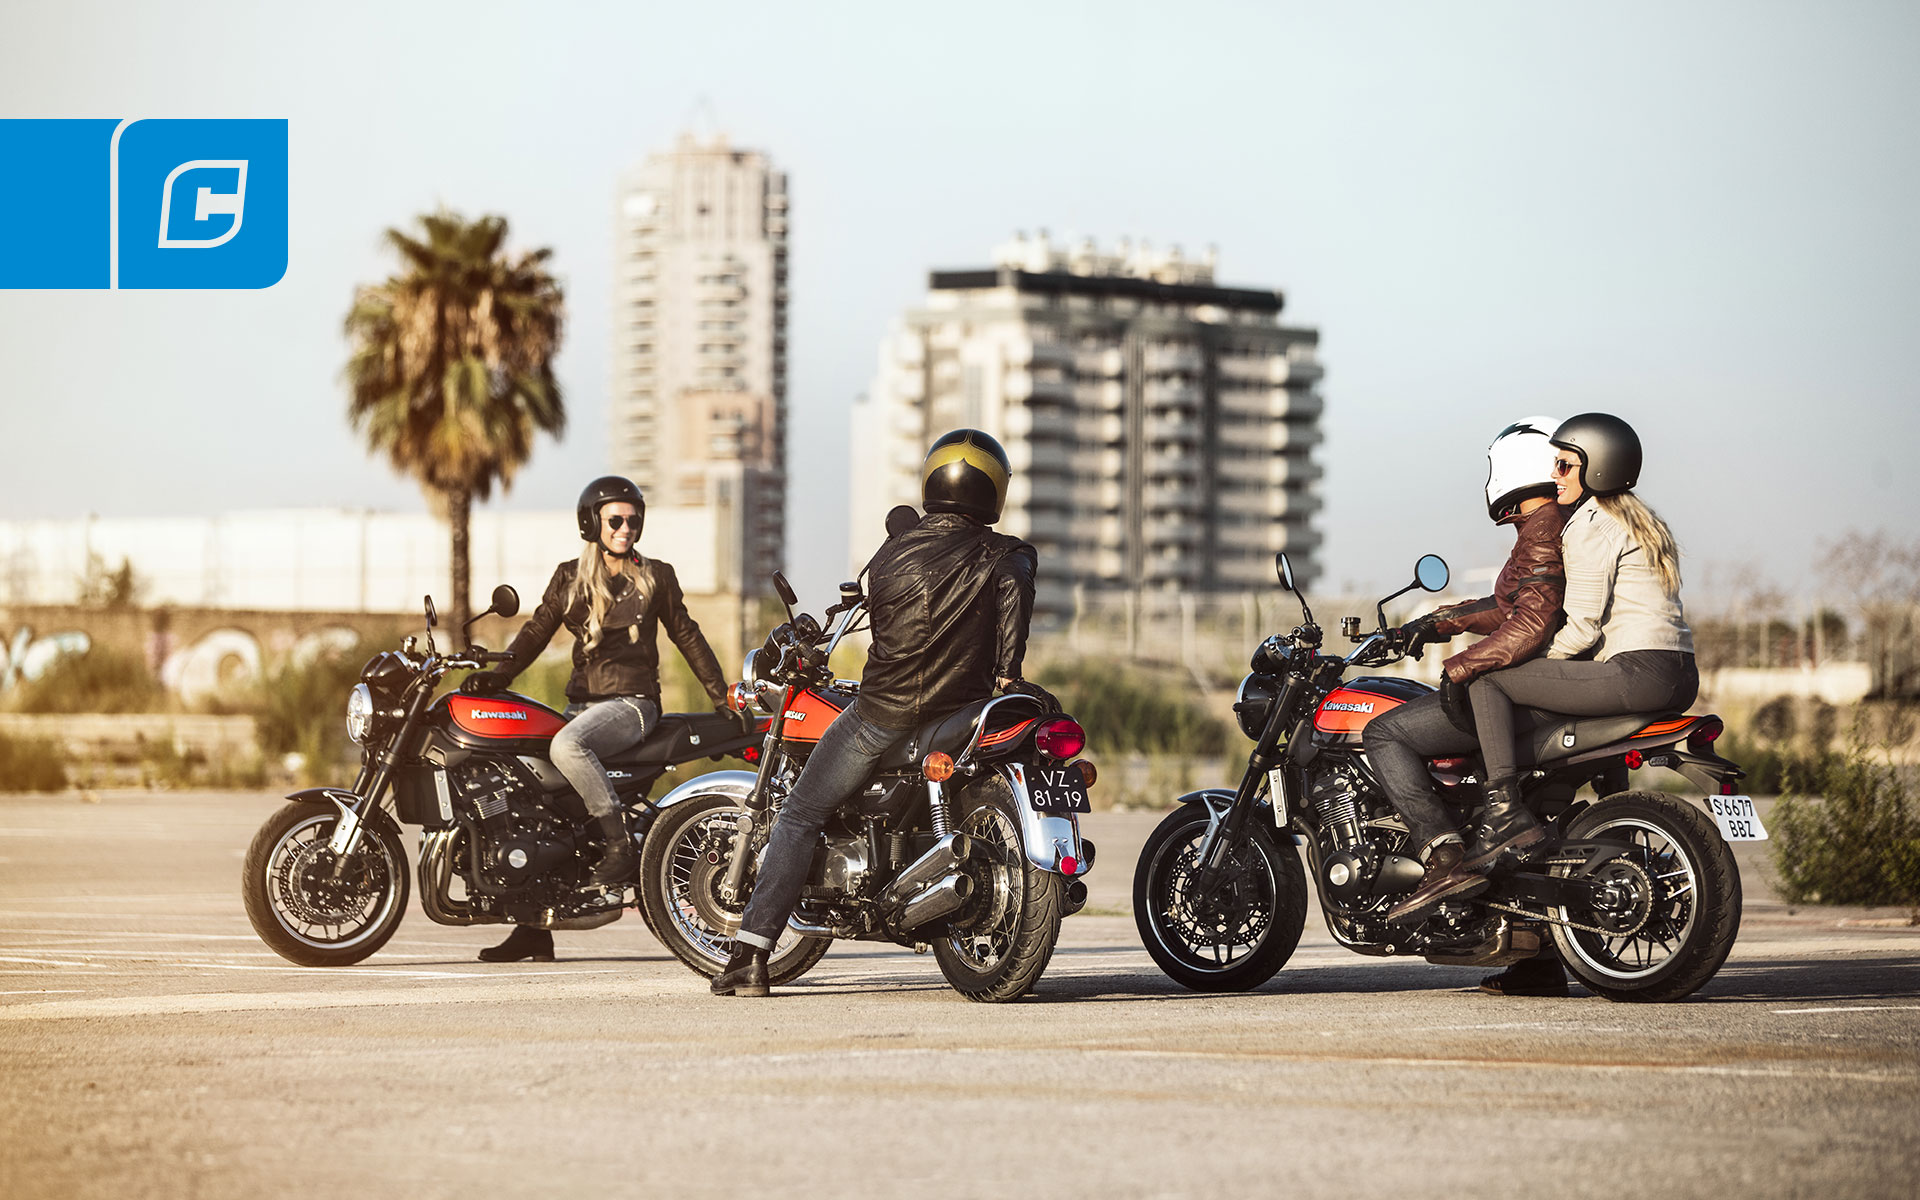 Honda Cbr1000rr Review >> Wallpaper: 2018 Kawasaki Z900RS - CycleOnline.com.au